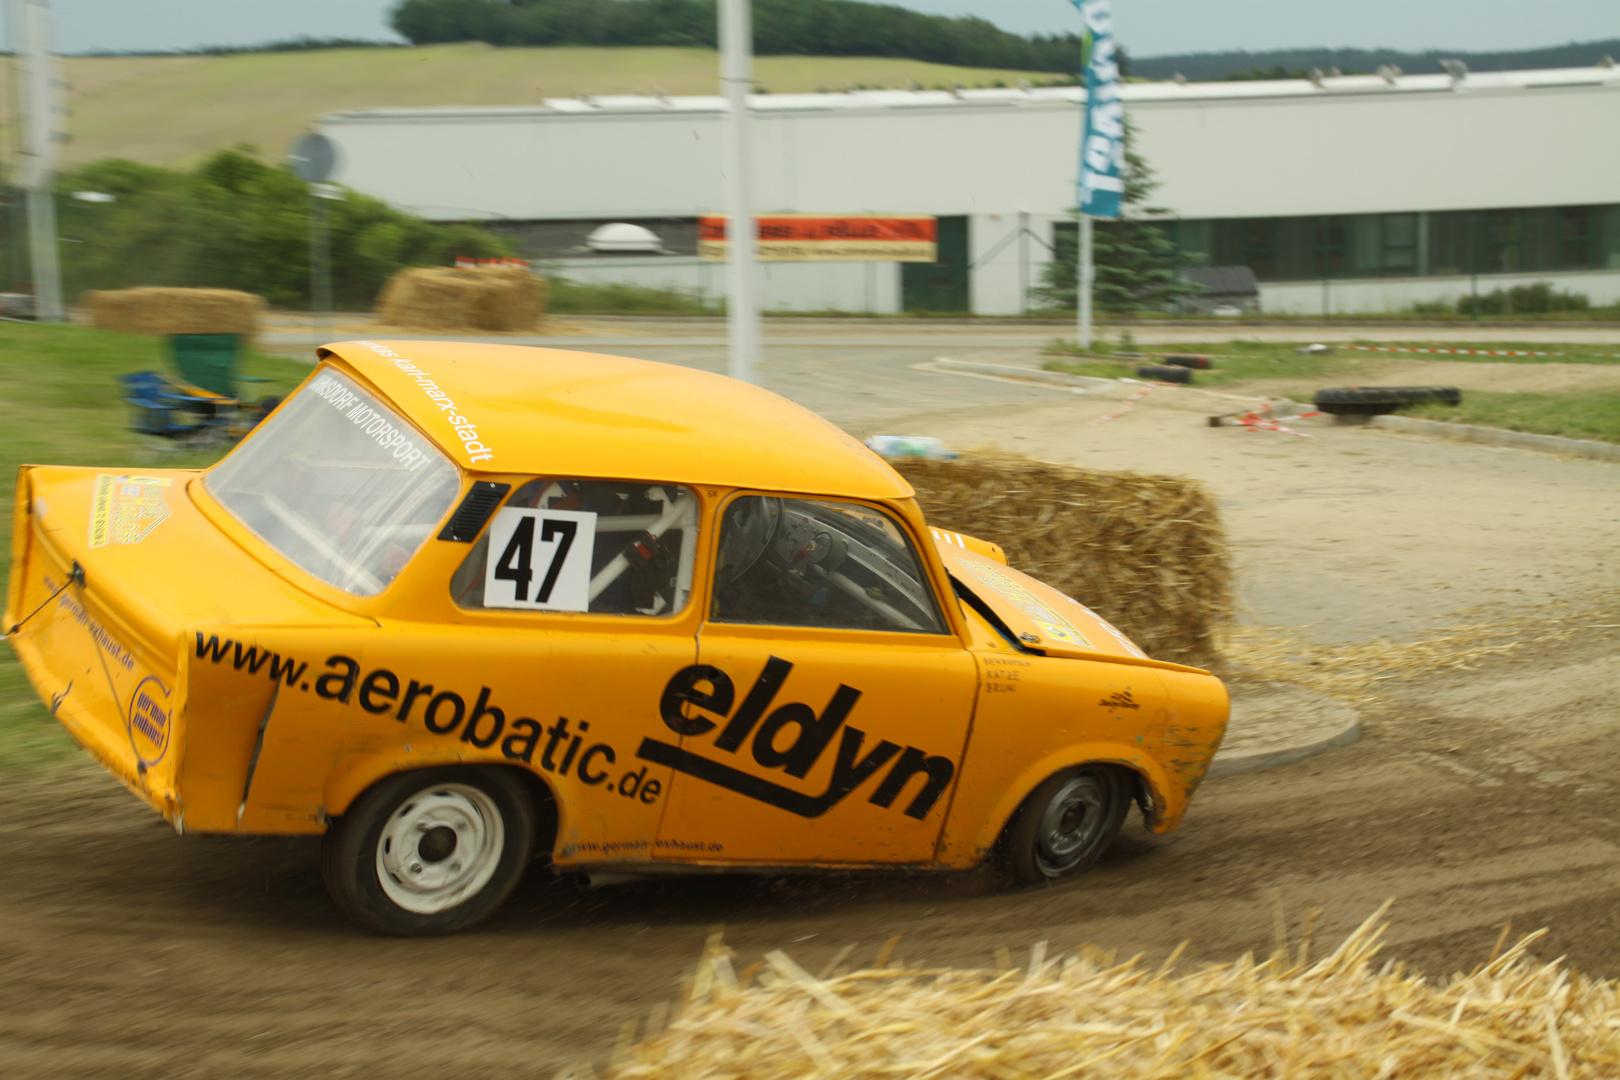 6.Trabantrennen Pausa 2010 Ziesche Eckl Racing